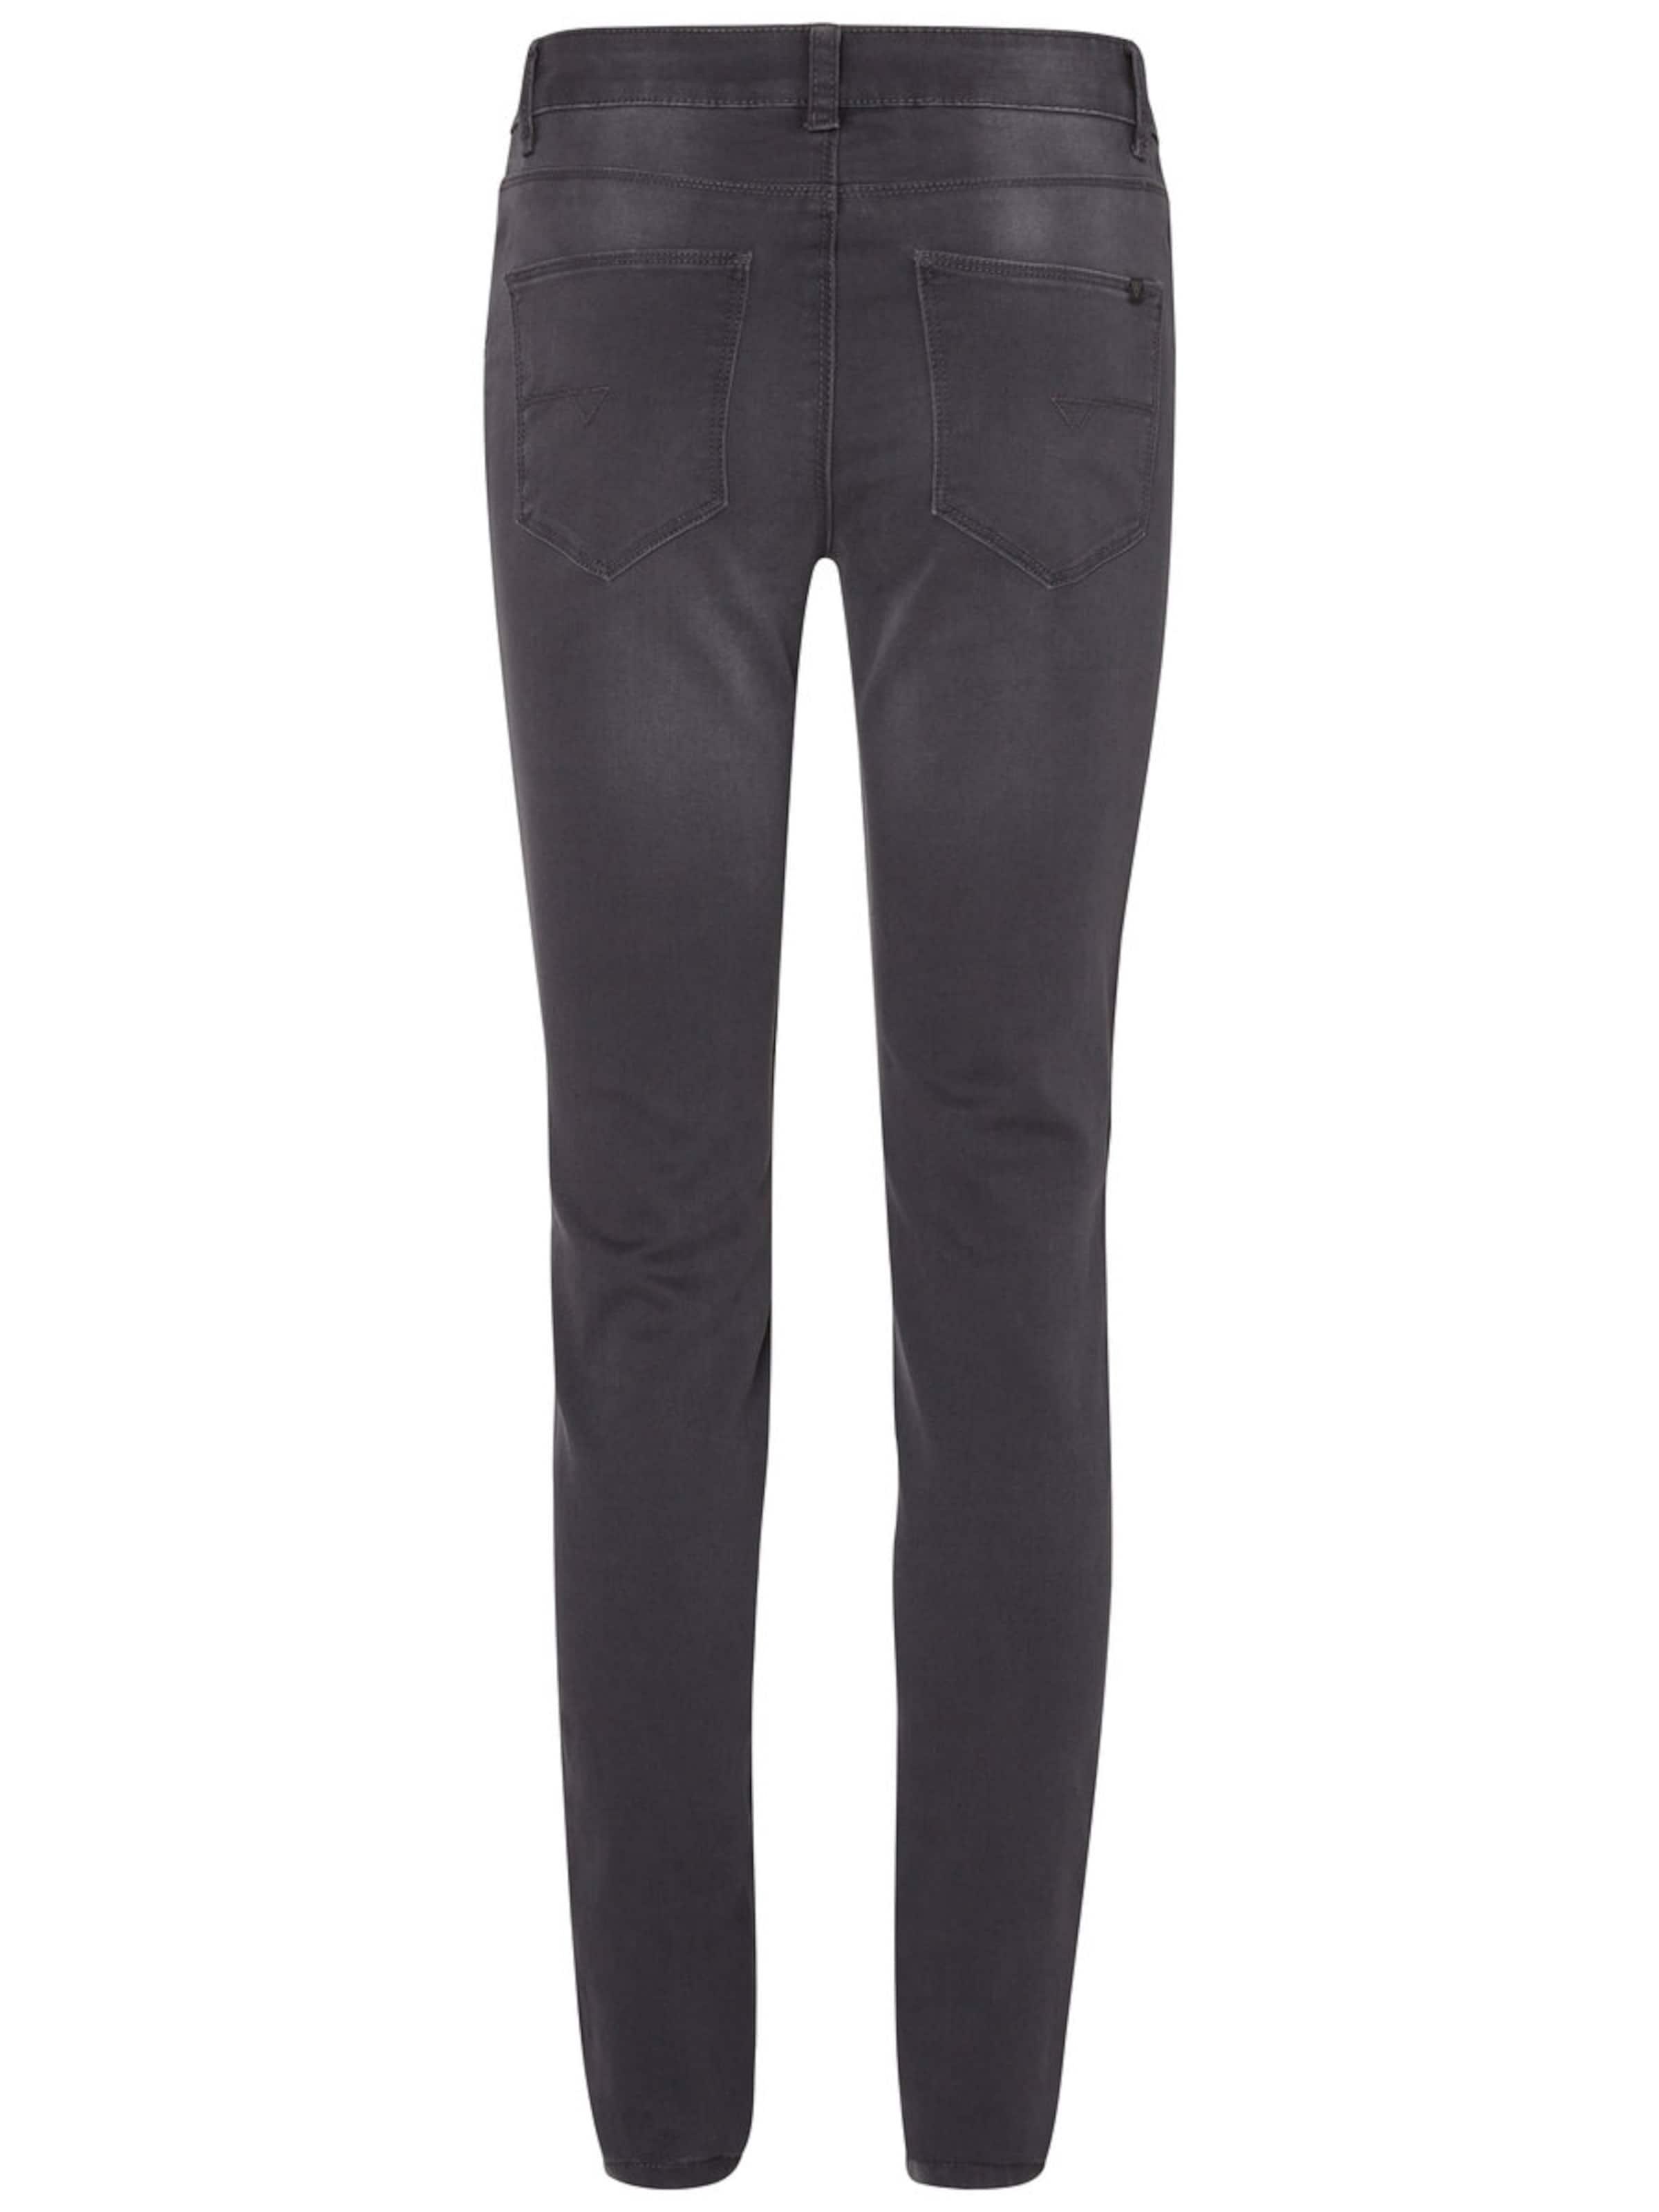 Noisy may Skinny Jeans Preise Günstig Online Verkauf Extrem Günstig Kaufen Klassisch VVI5UDHSNT